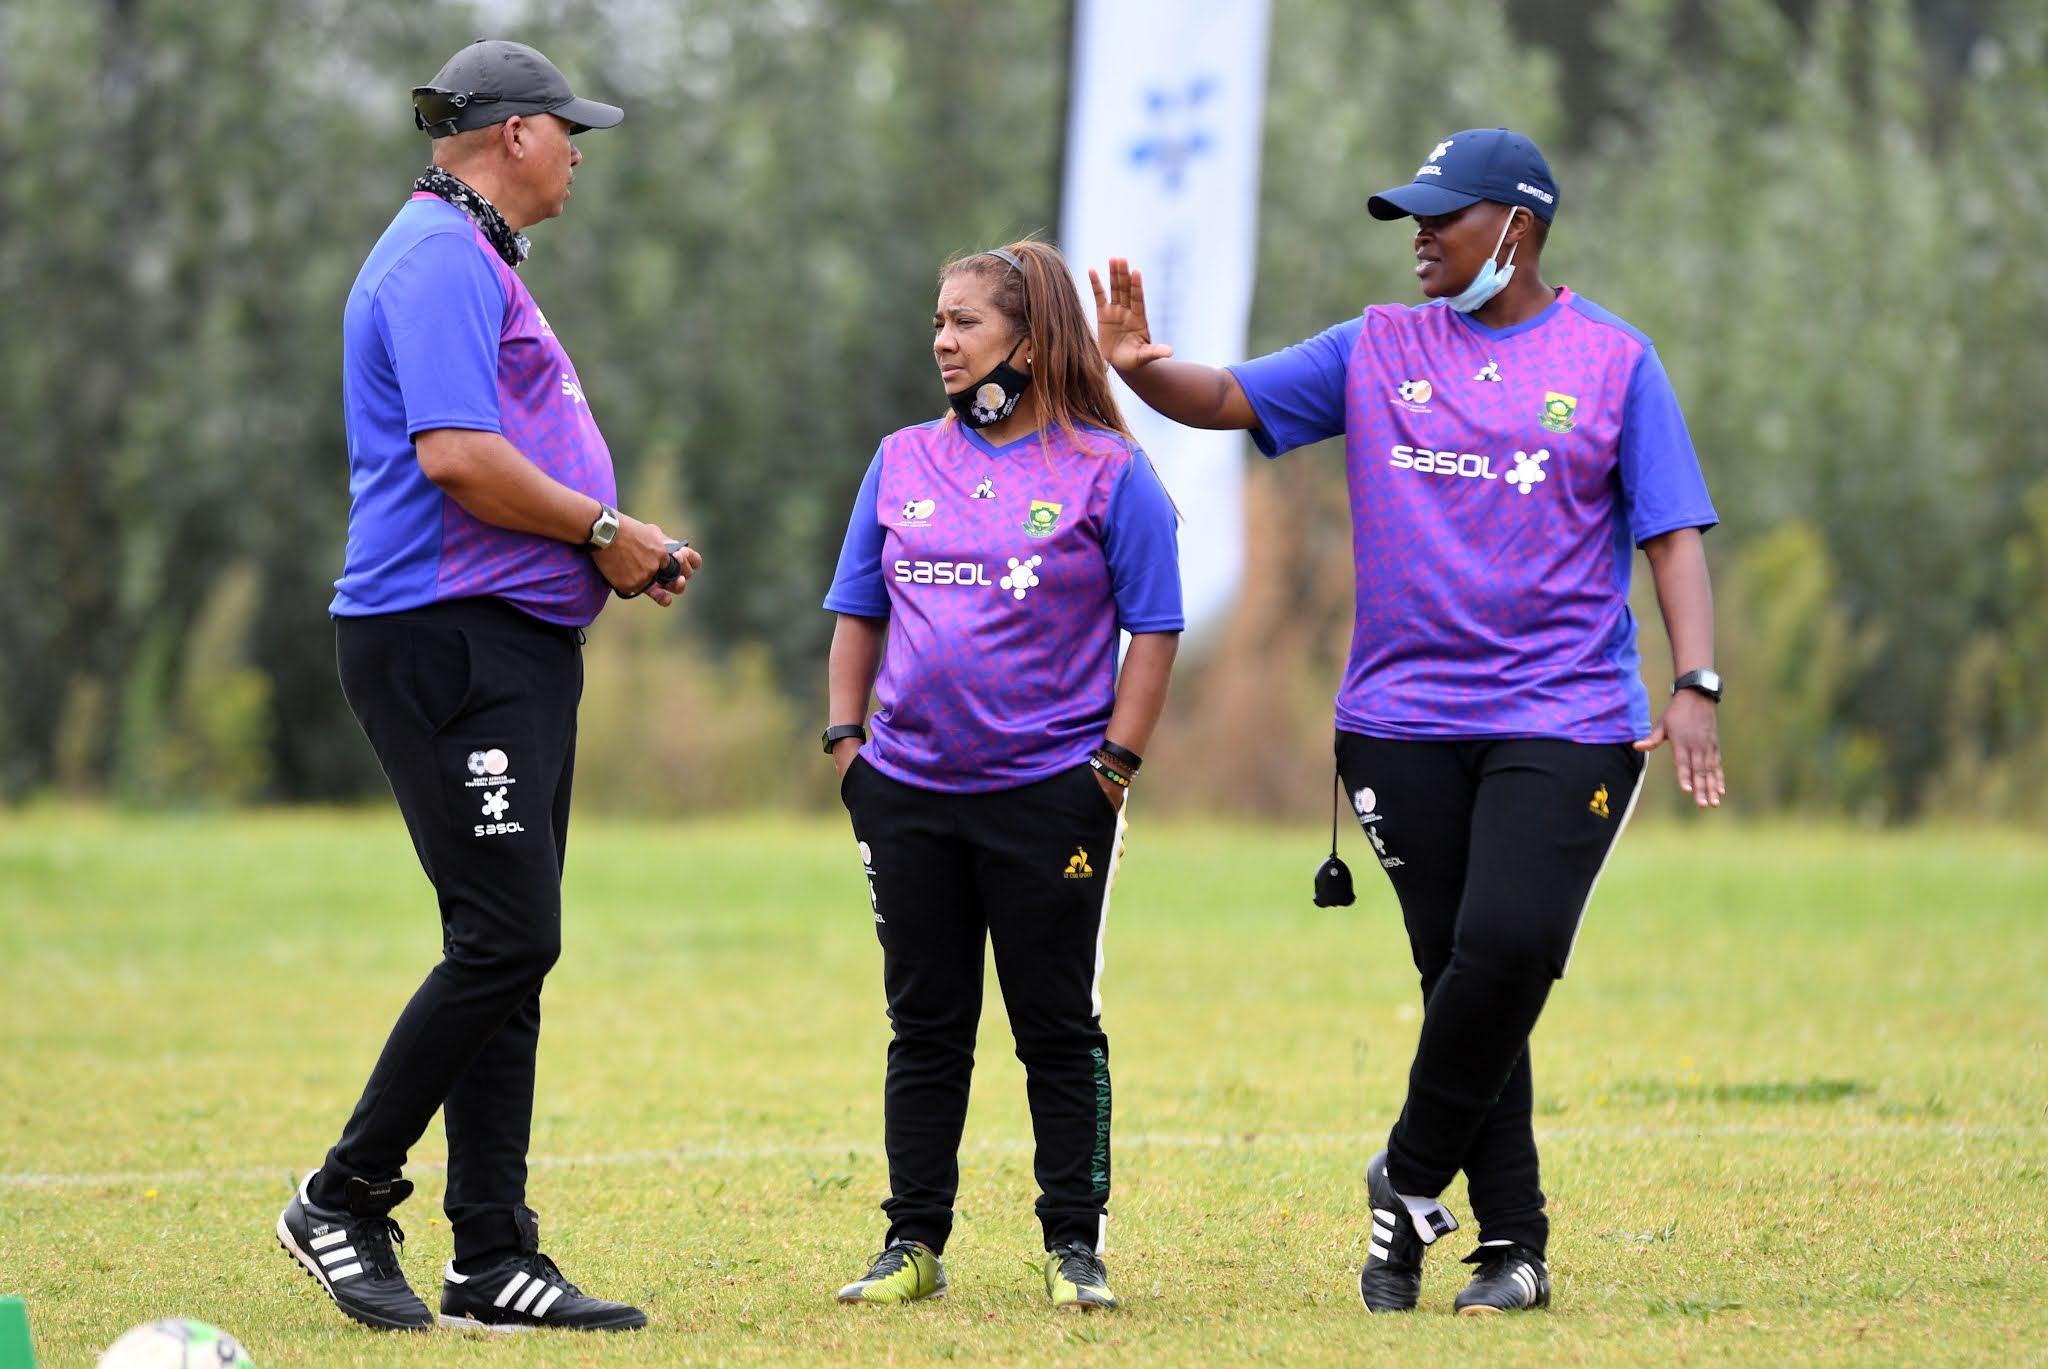 Banyana Banyana coaches Desiree Ellis and Thinasonke Mbuli